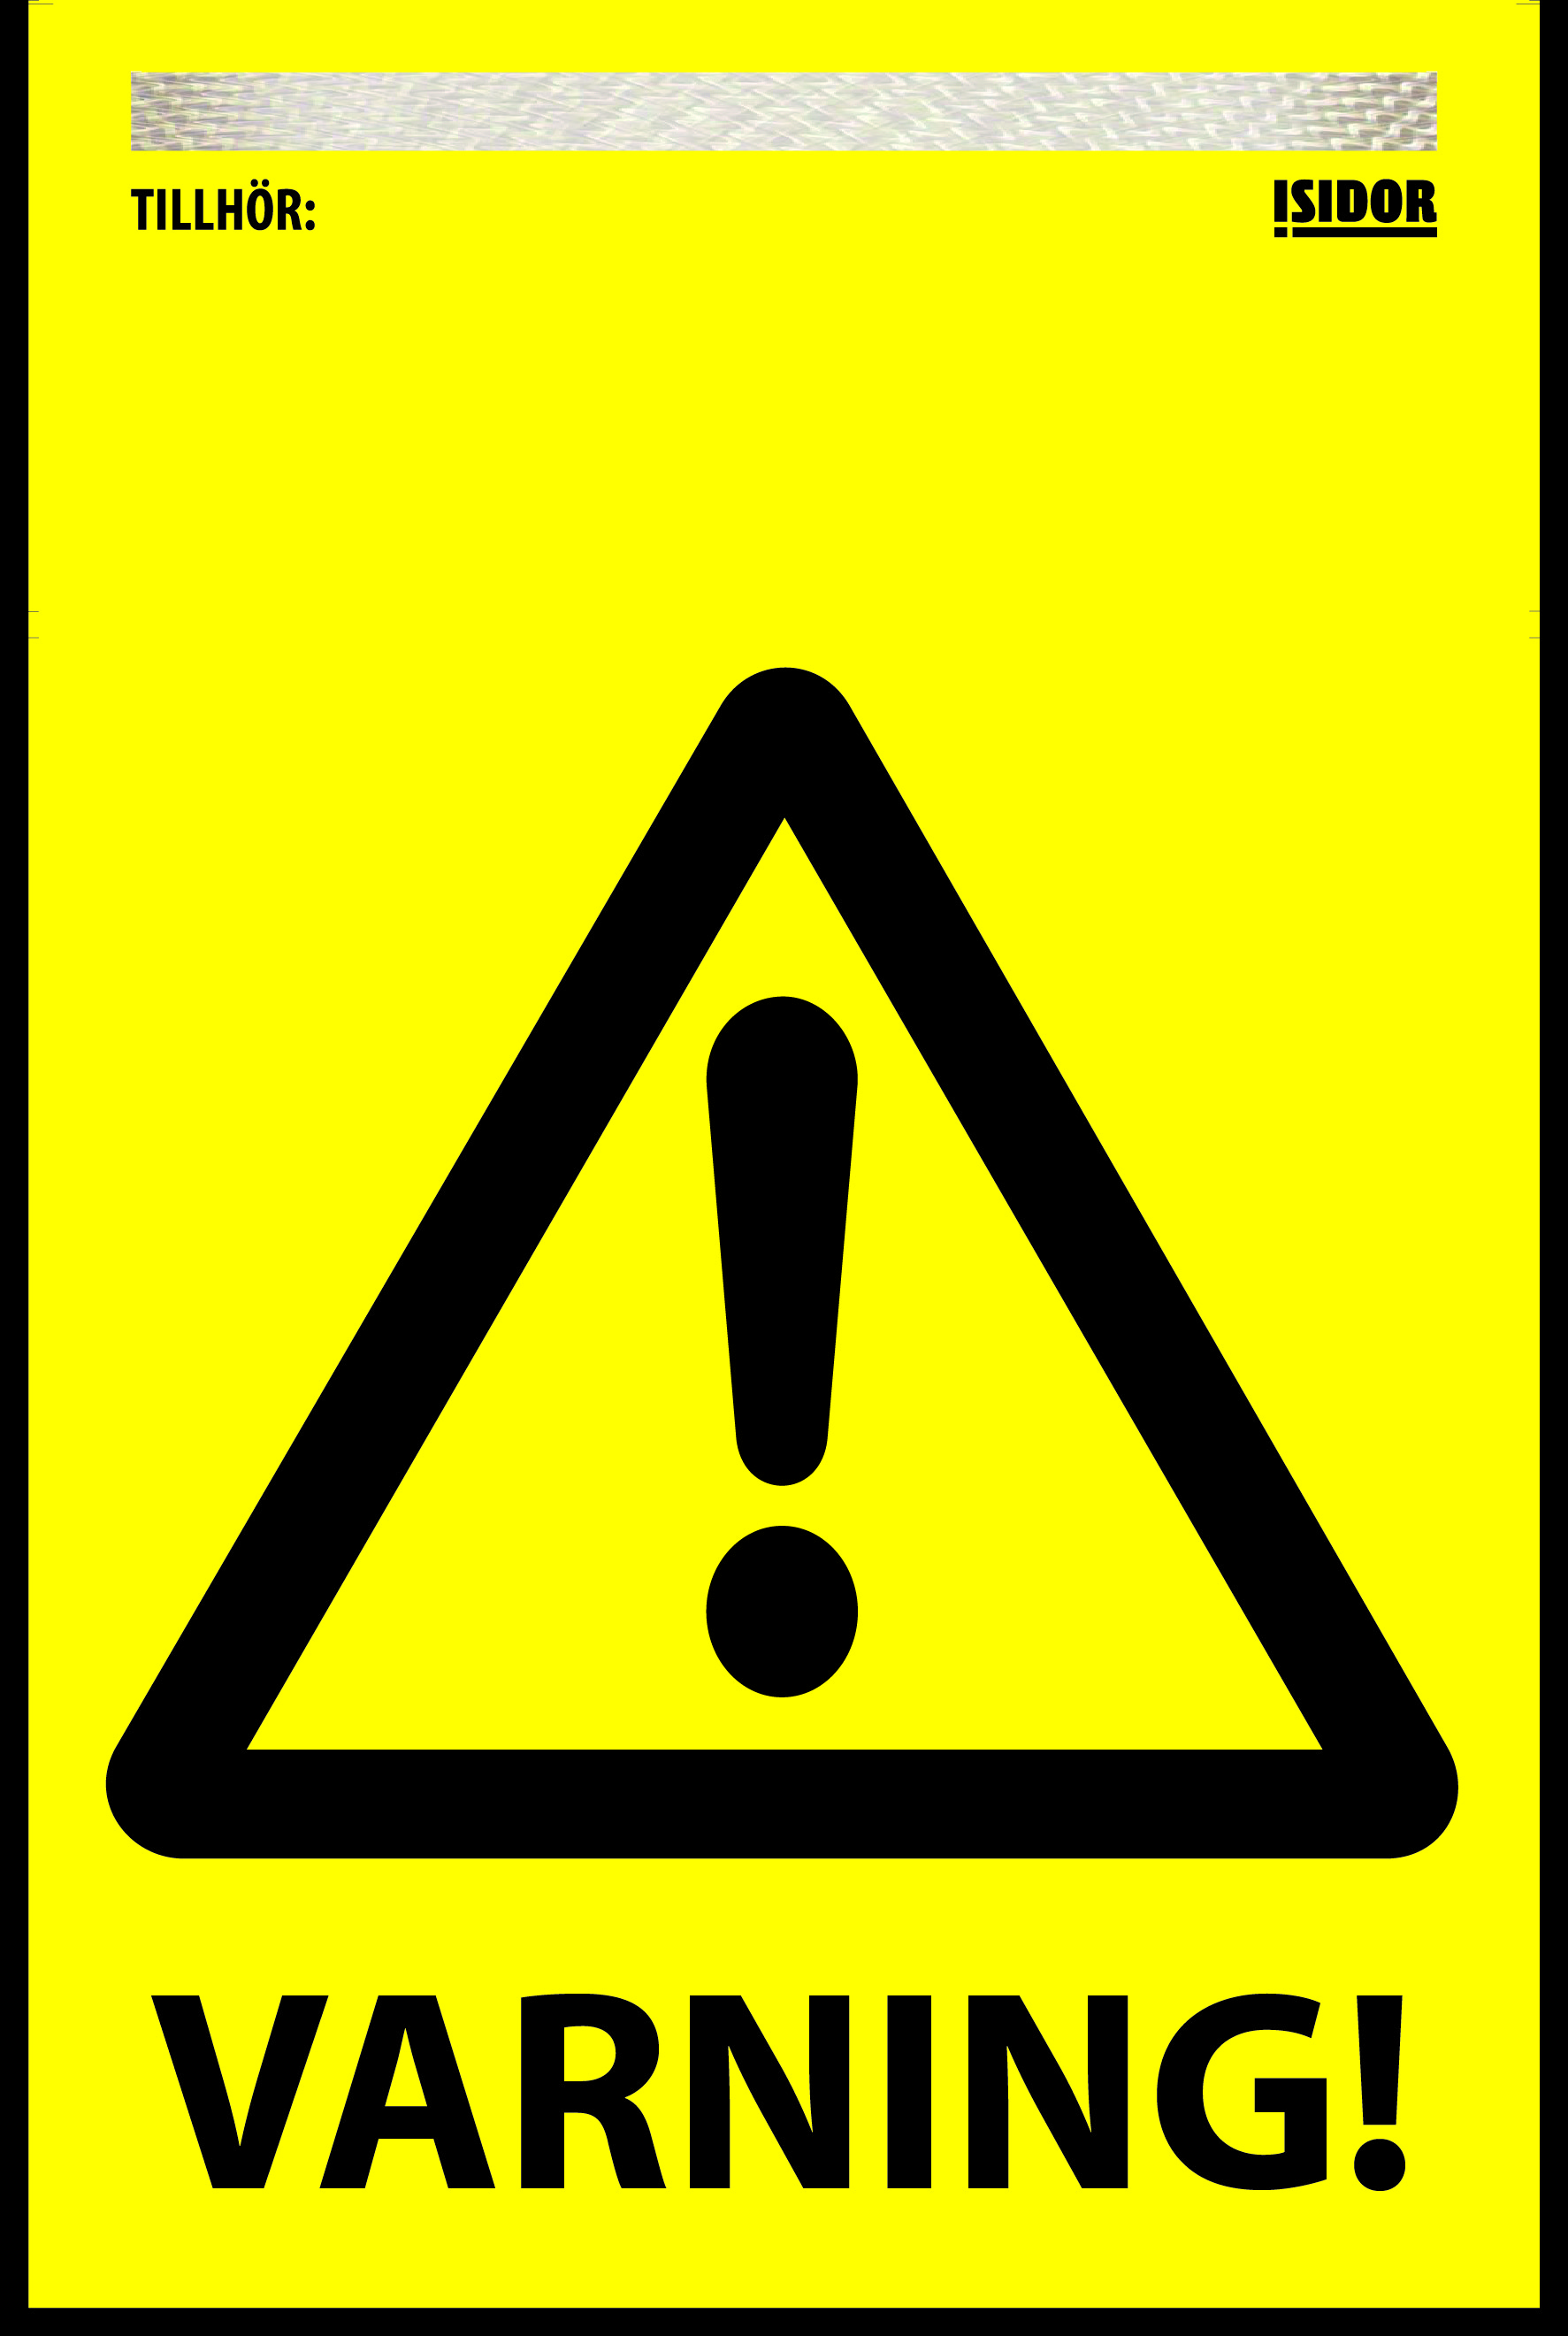 180720_isidor_flag_Yellow_30x57-Varning-01.jpg